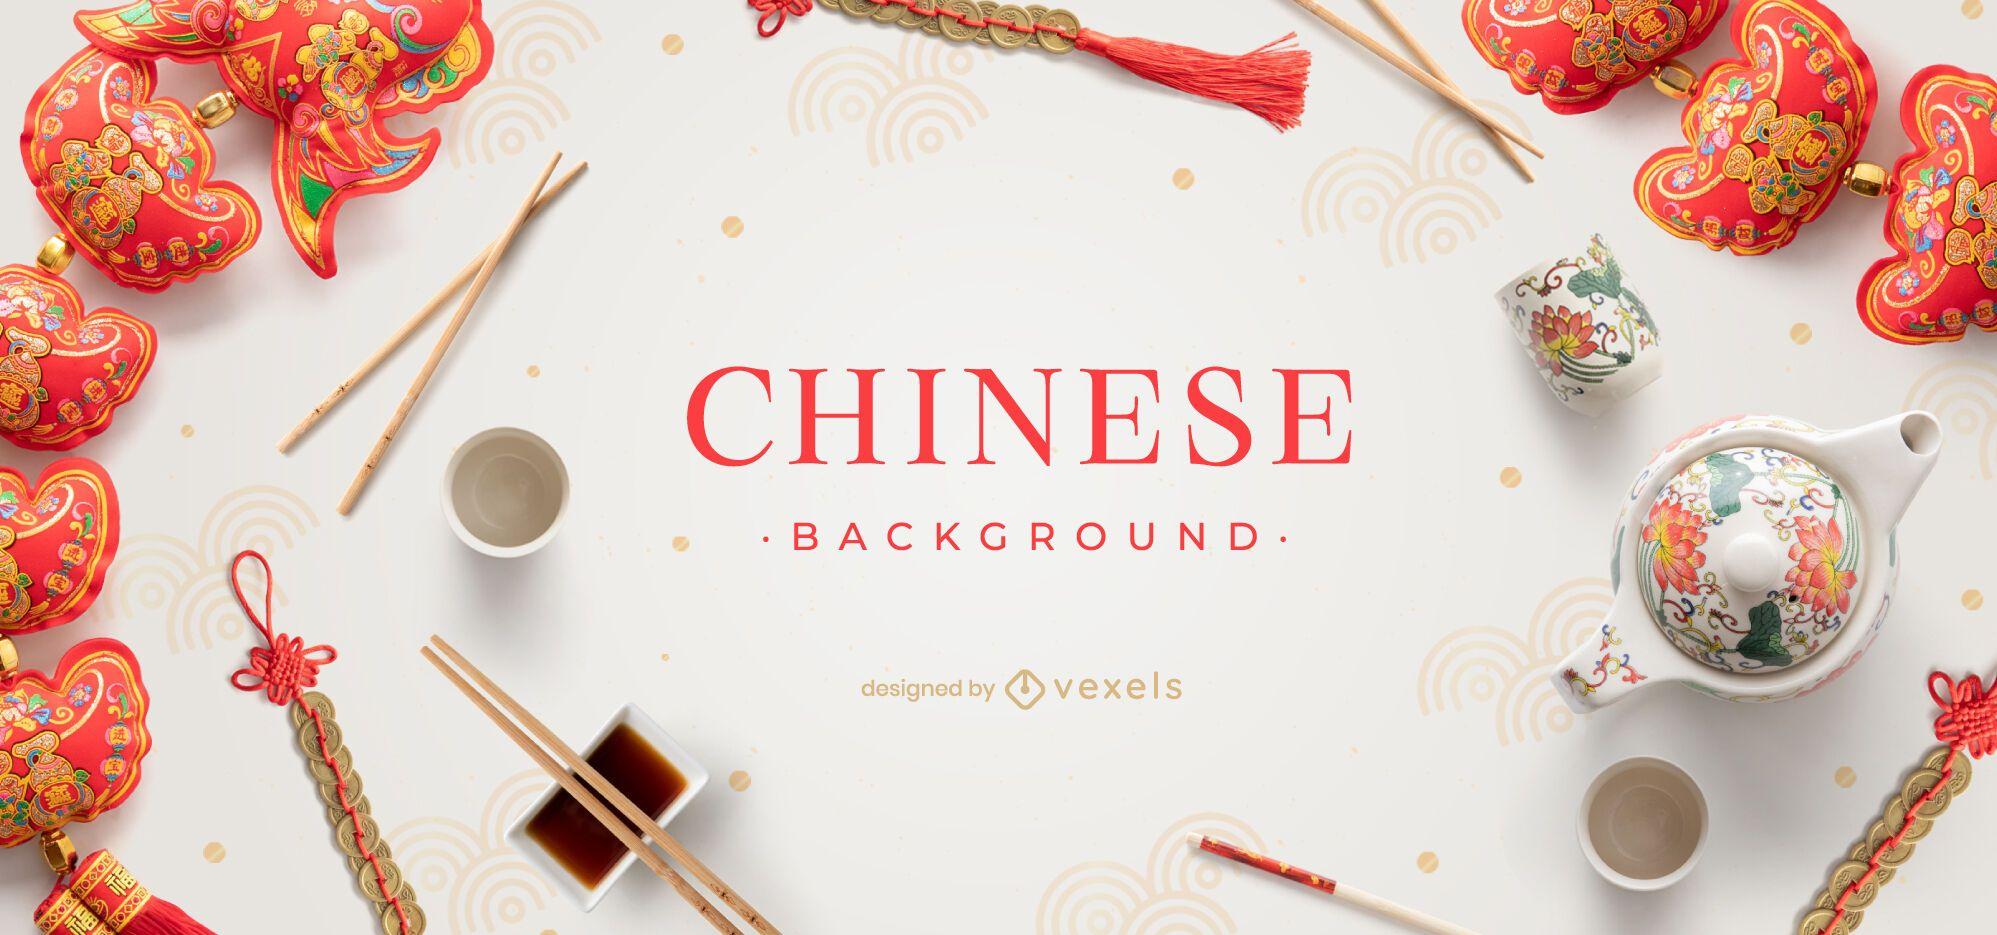 Chinese elements background design